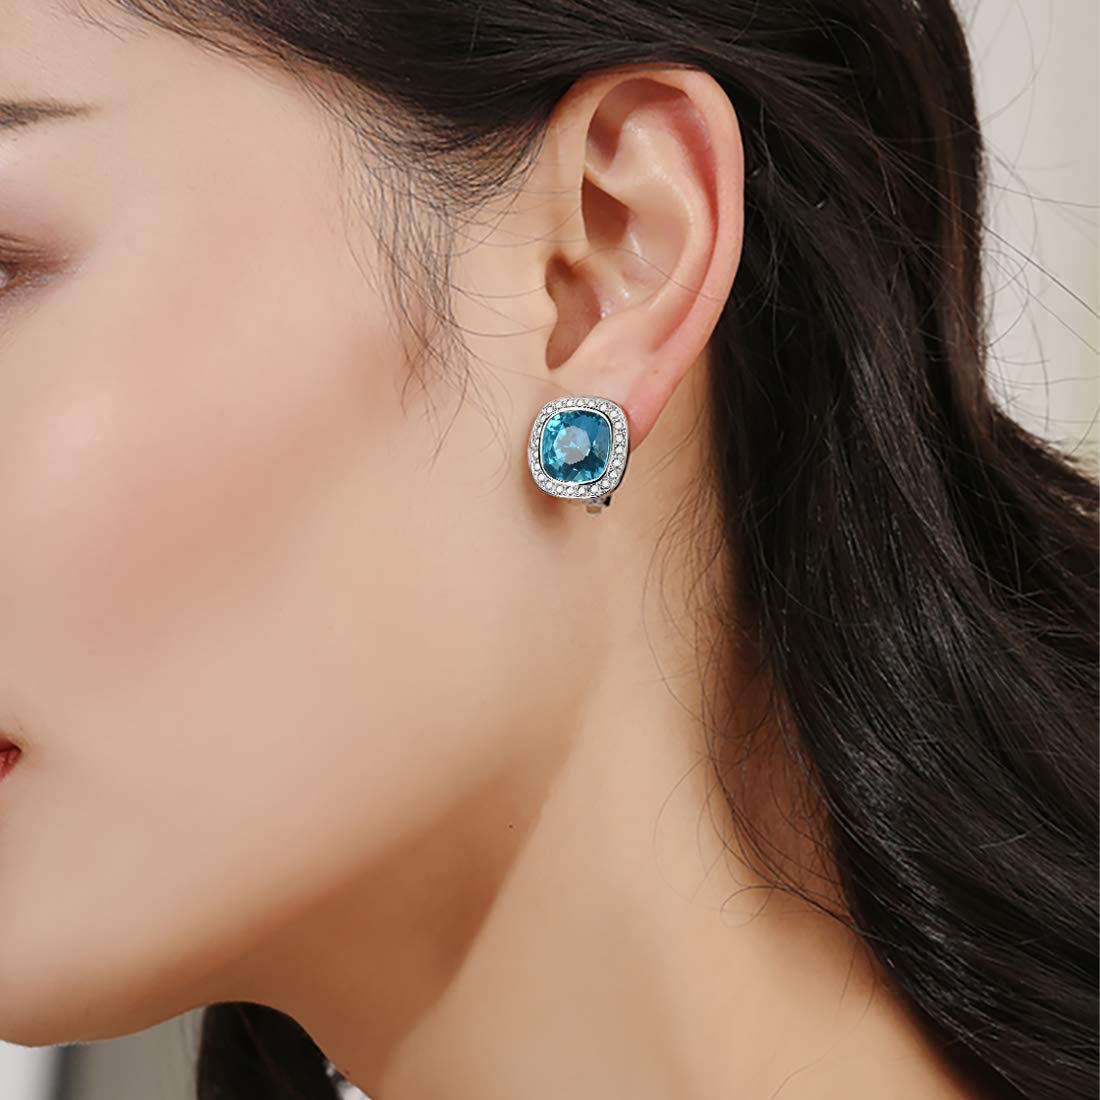 Clip-on Earrings For Women And Girls Swarovski Elements Blue Crystal Ear Clip